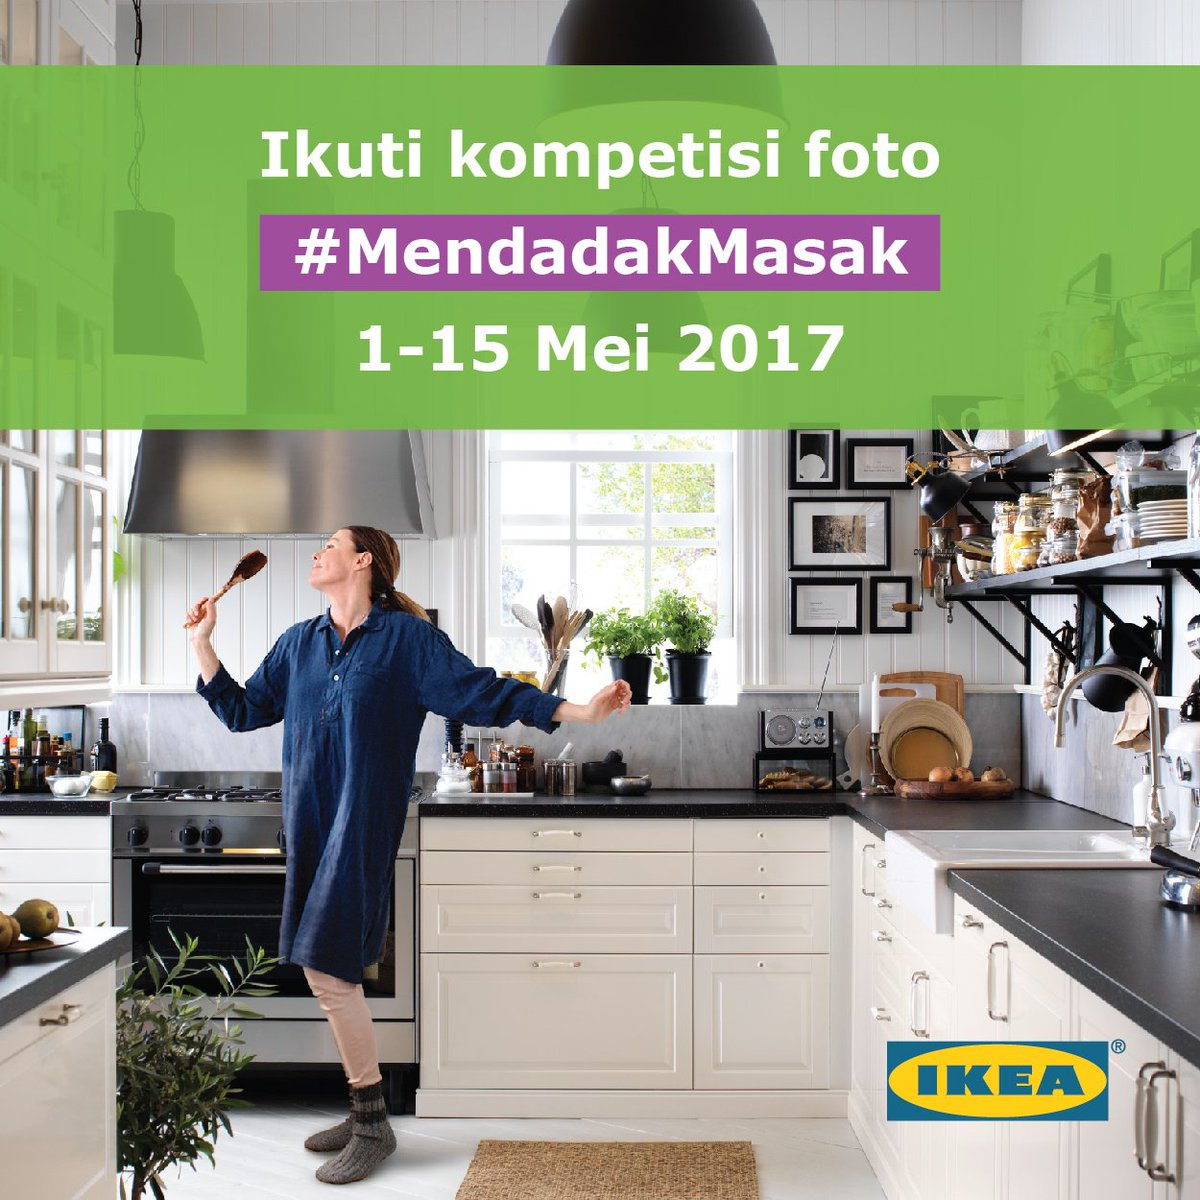 Ikea Indonesia على تويتر Dapatkan Gift Voucher Ikea Senilai 500rb